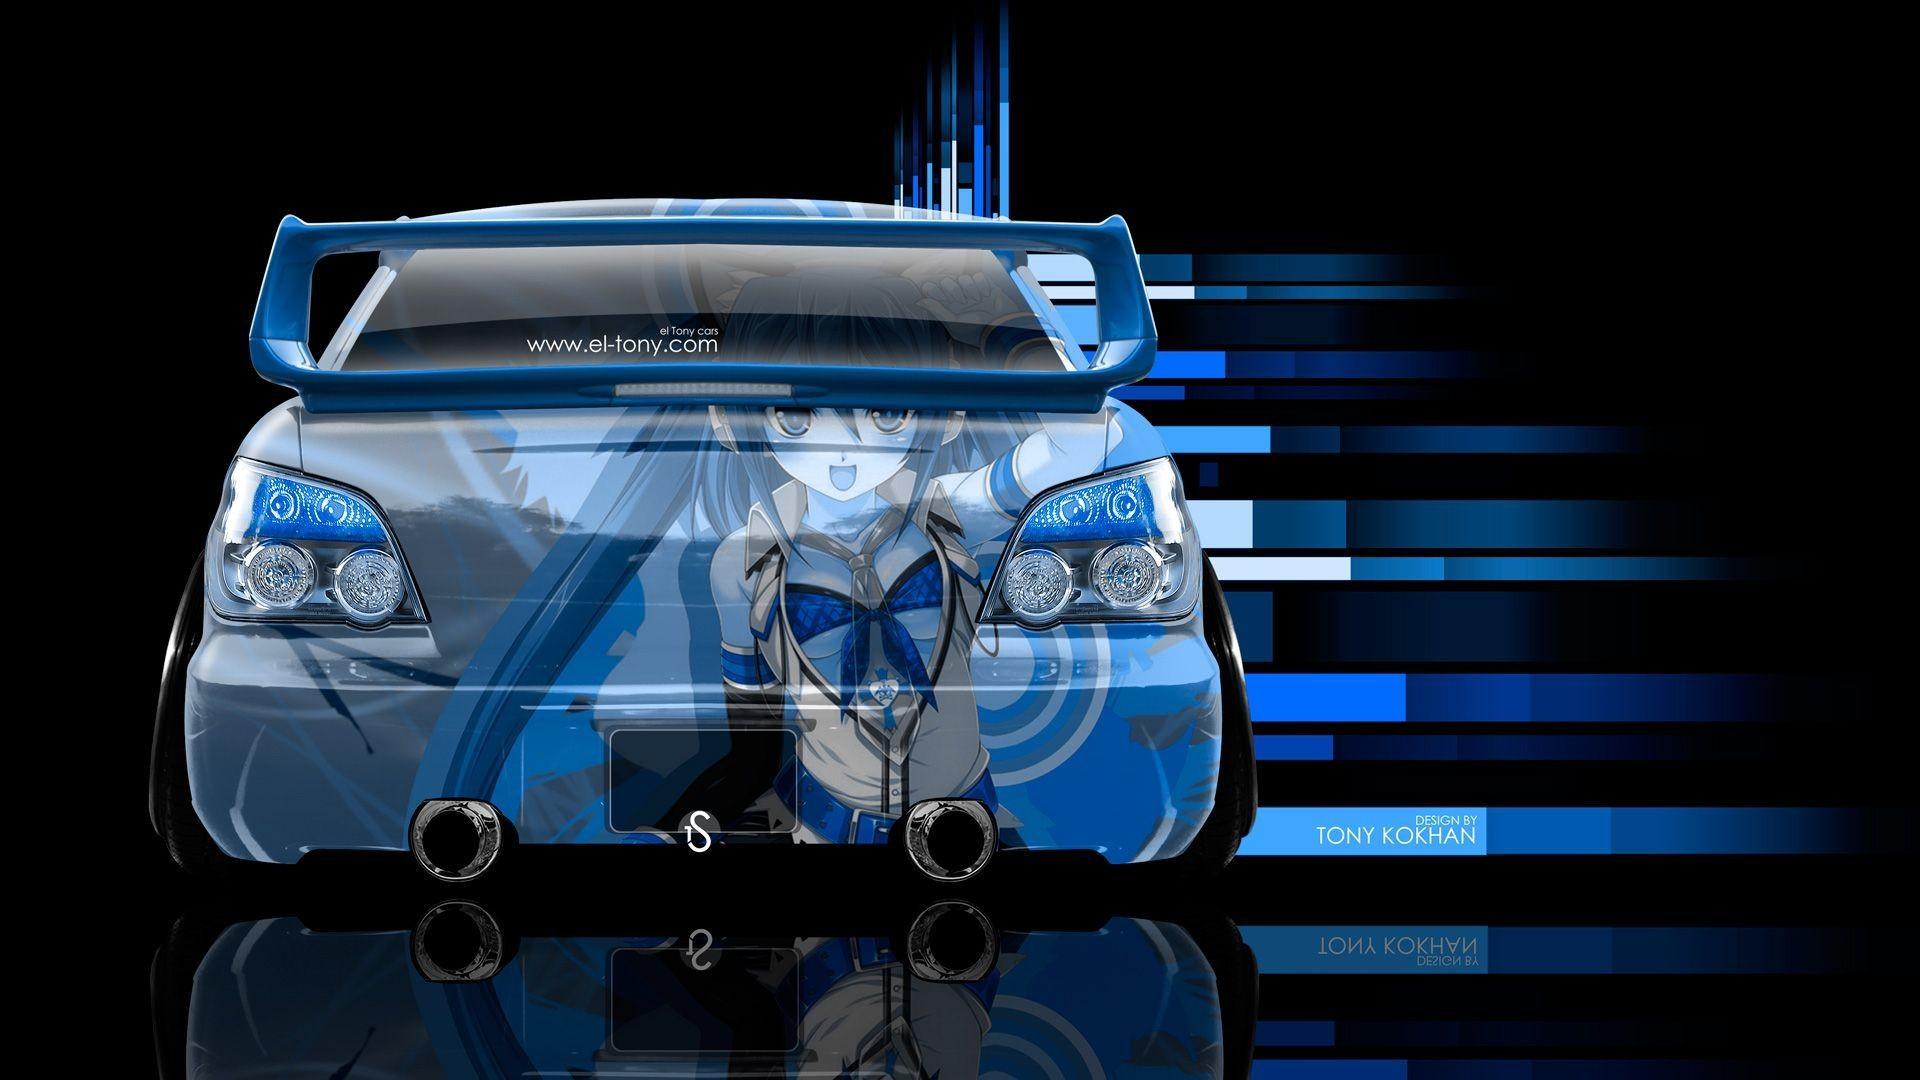 1920x1080 Subcategory: Subaru Wallpapers